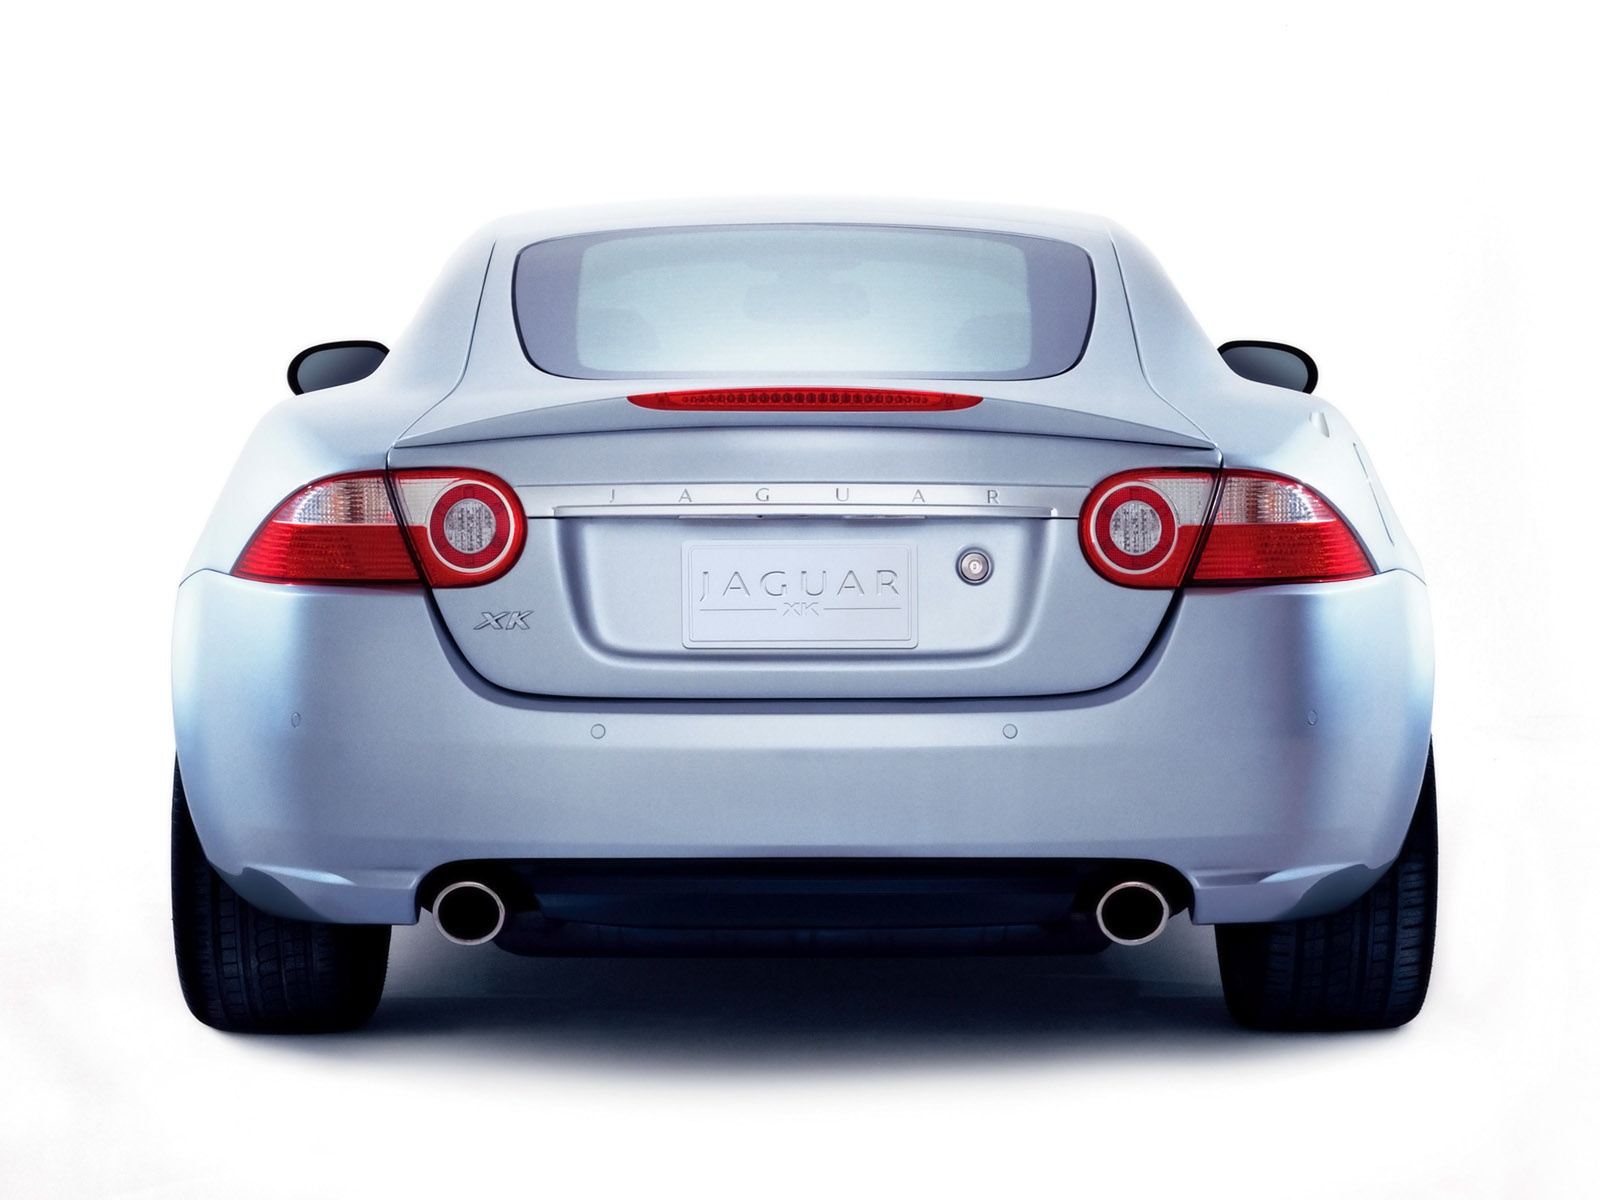 5 Jaguar XK HD Wallpapers   Background Images - Wallpaper ...